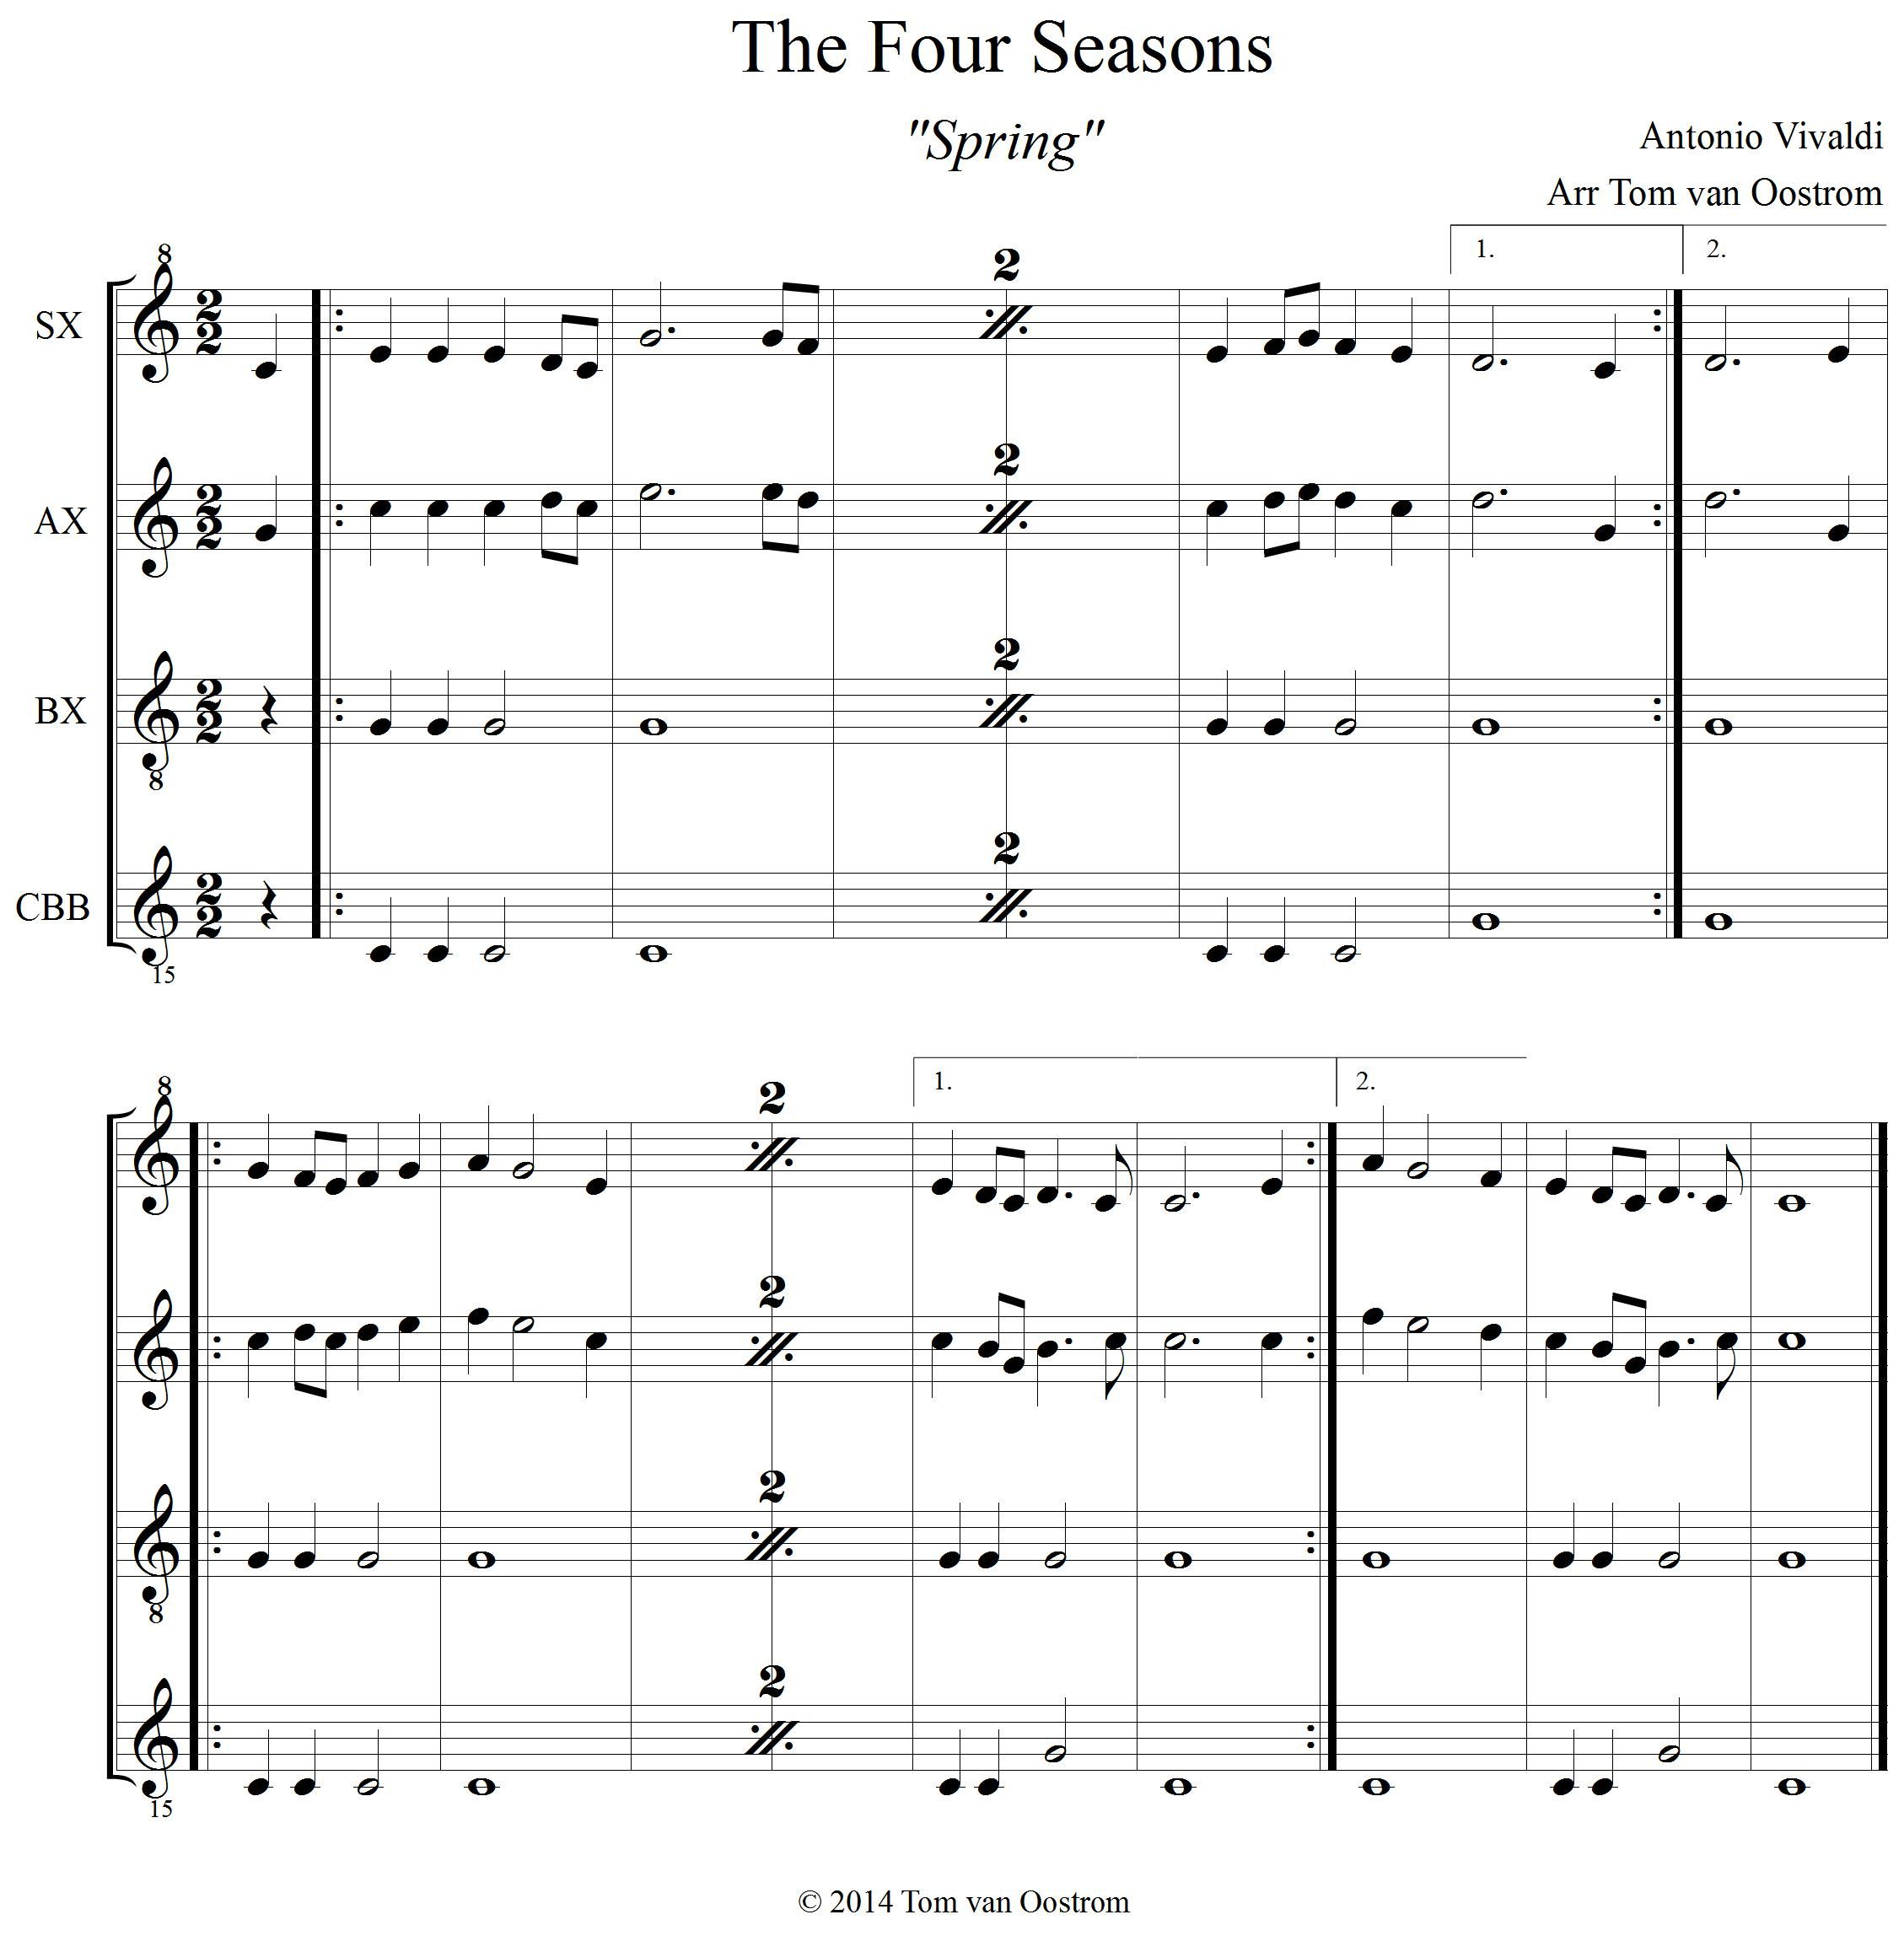 The Four Seasons Spring Orff Arrangement